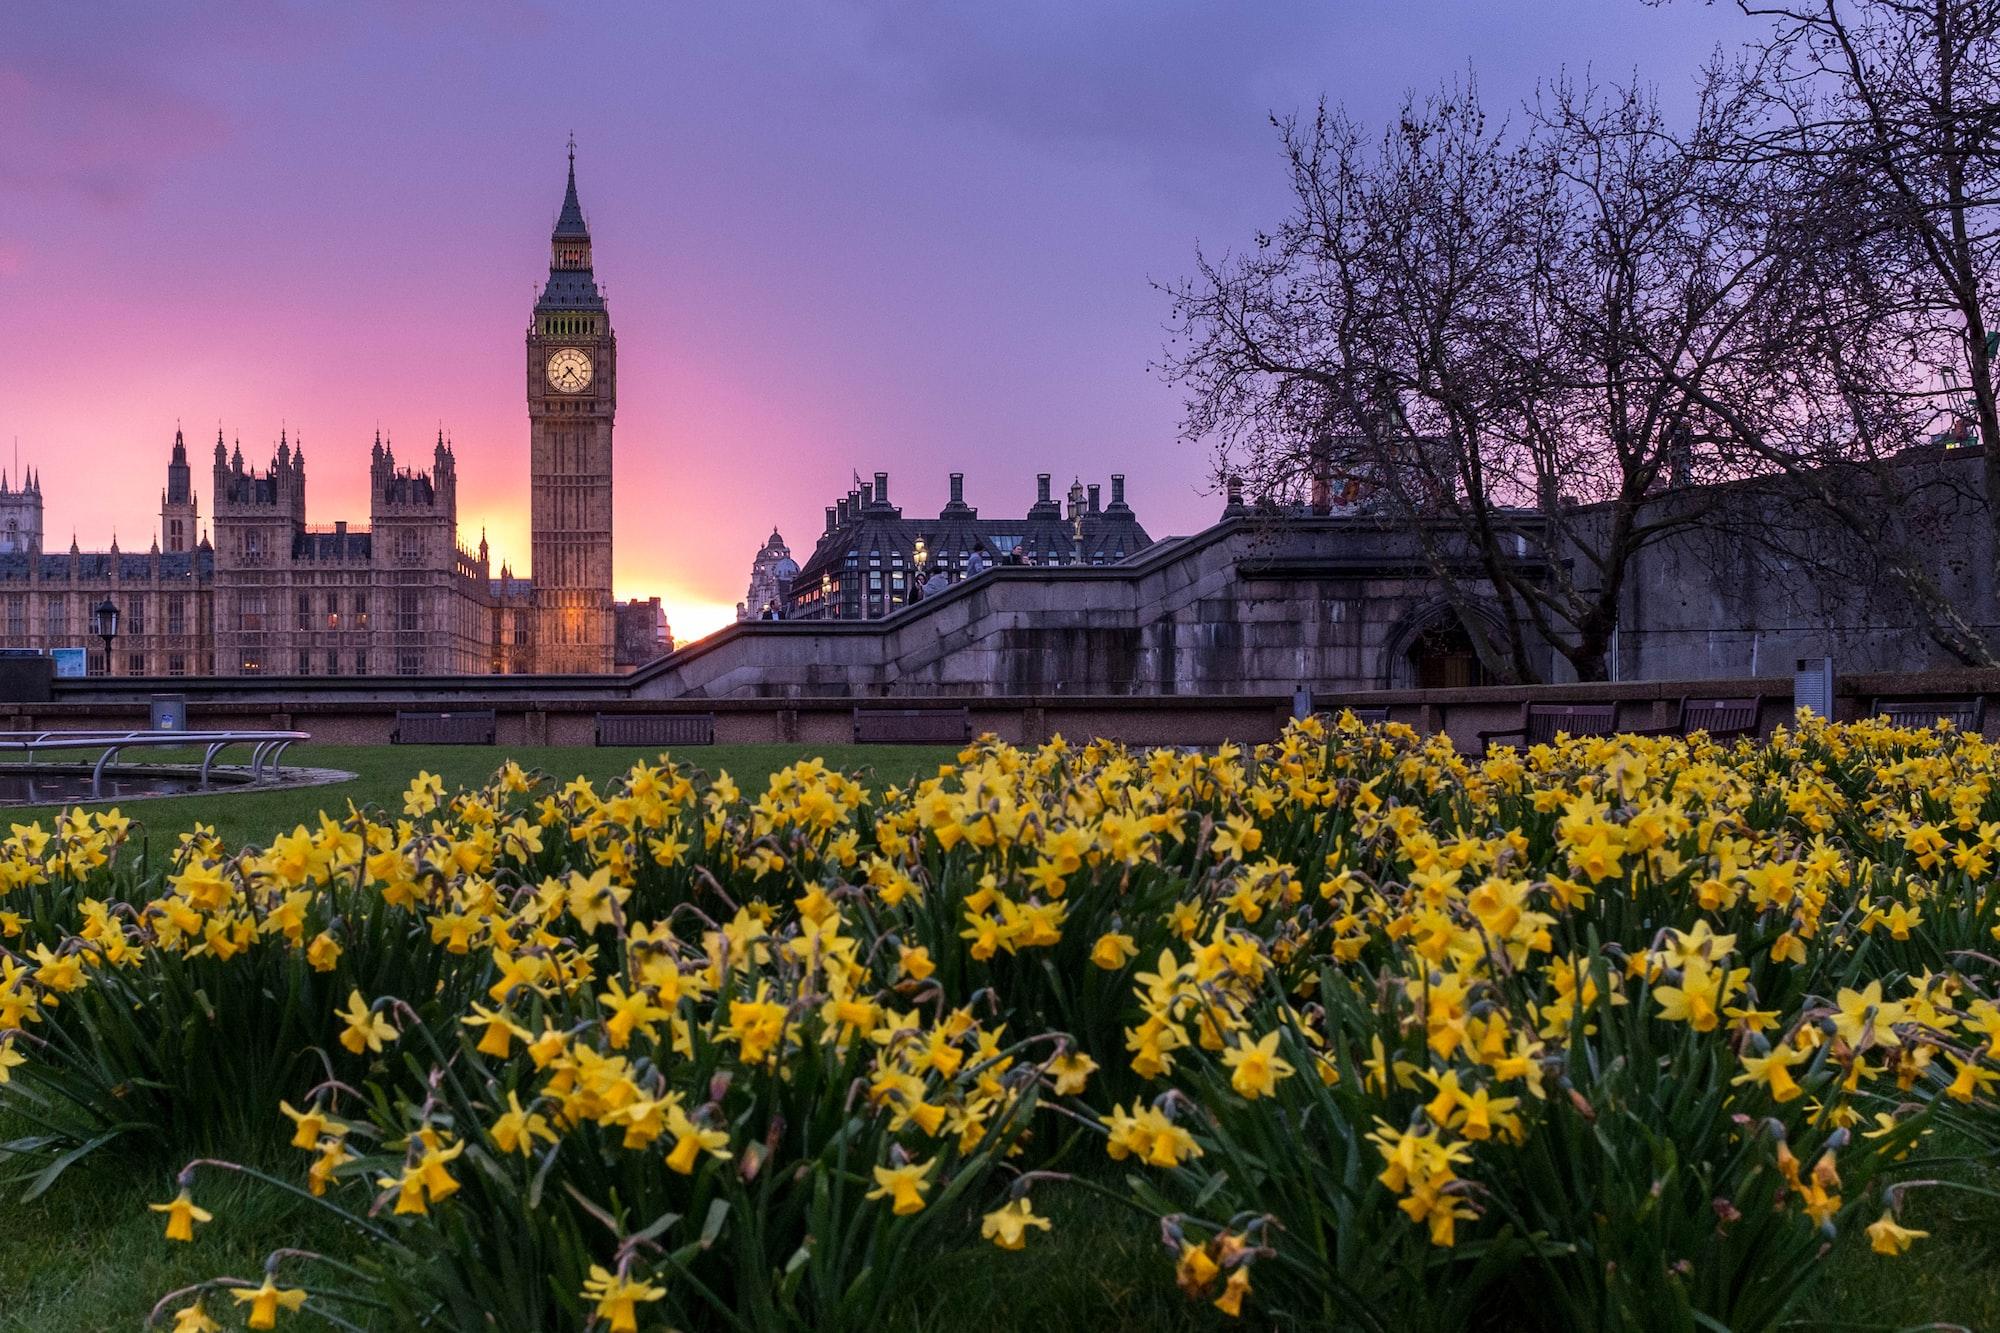 UK Government Communication/Social Orchestration Platform